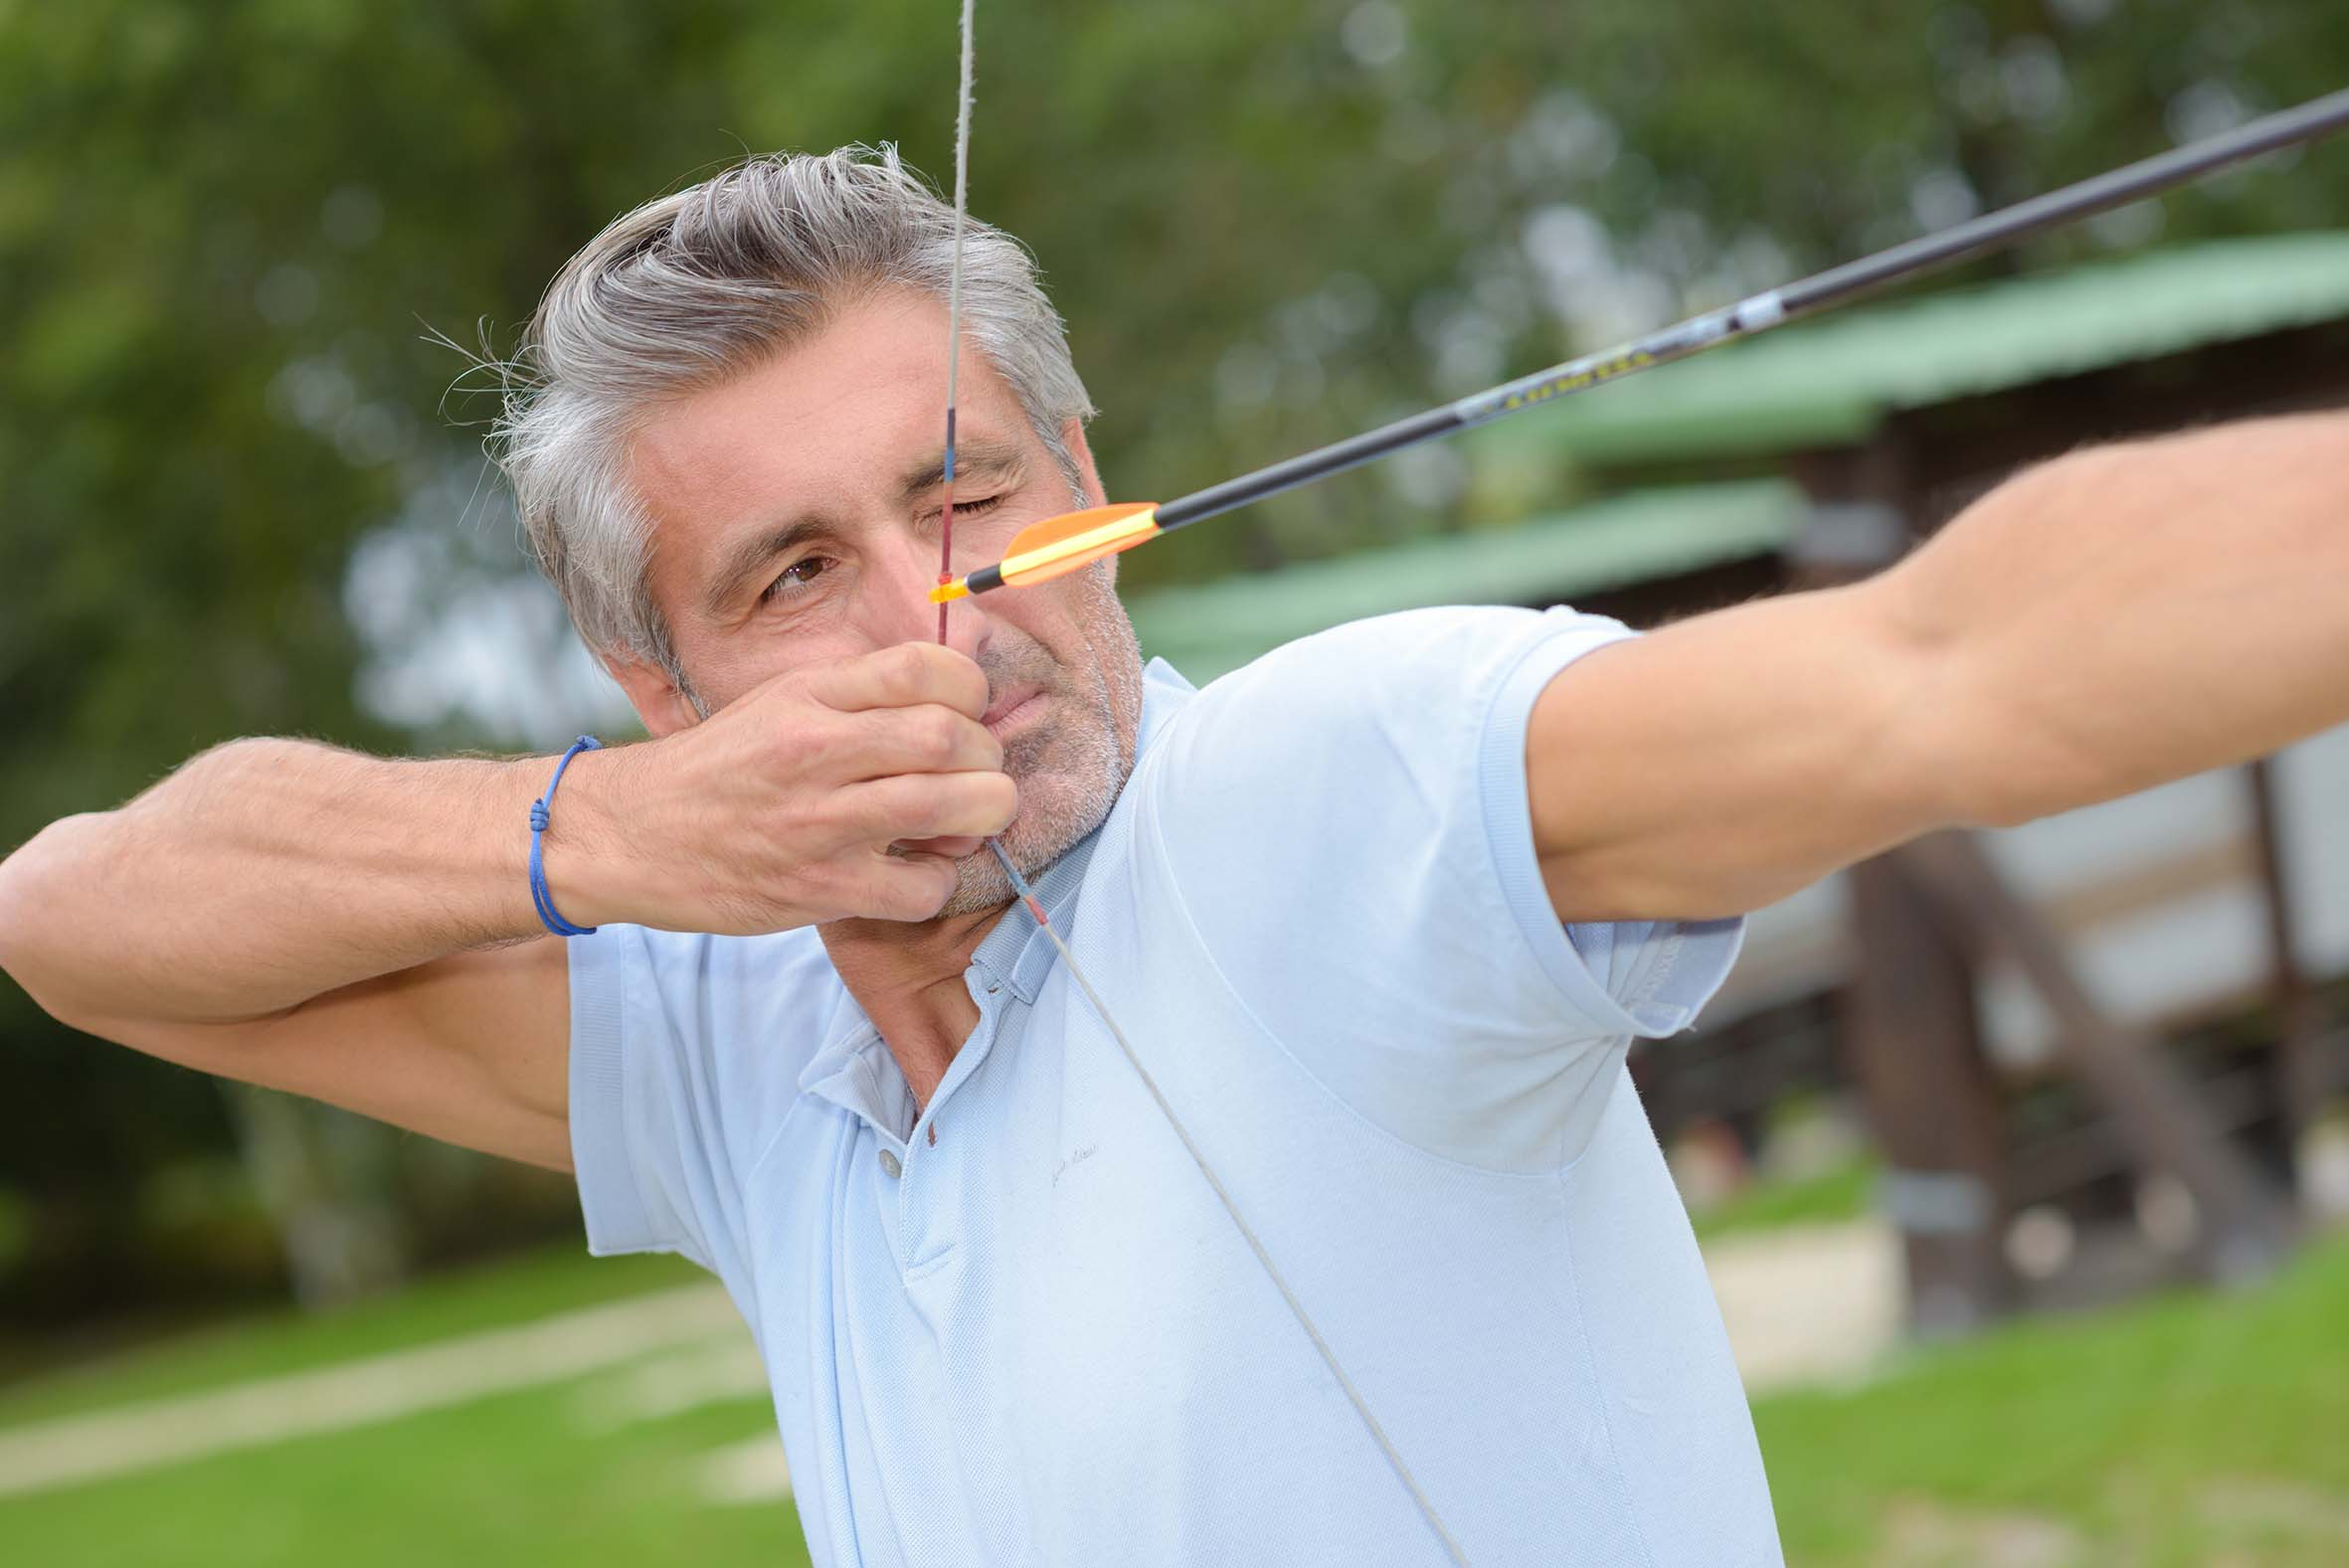 Man aiming bow and arrow